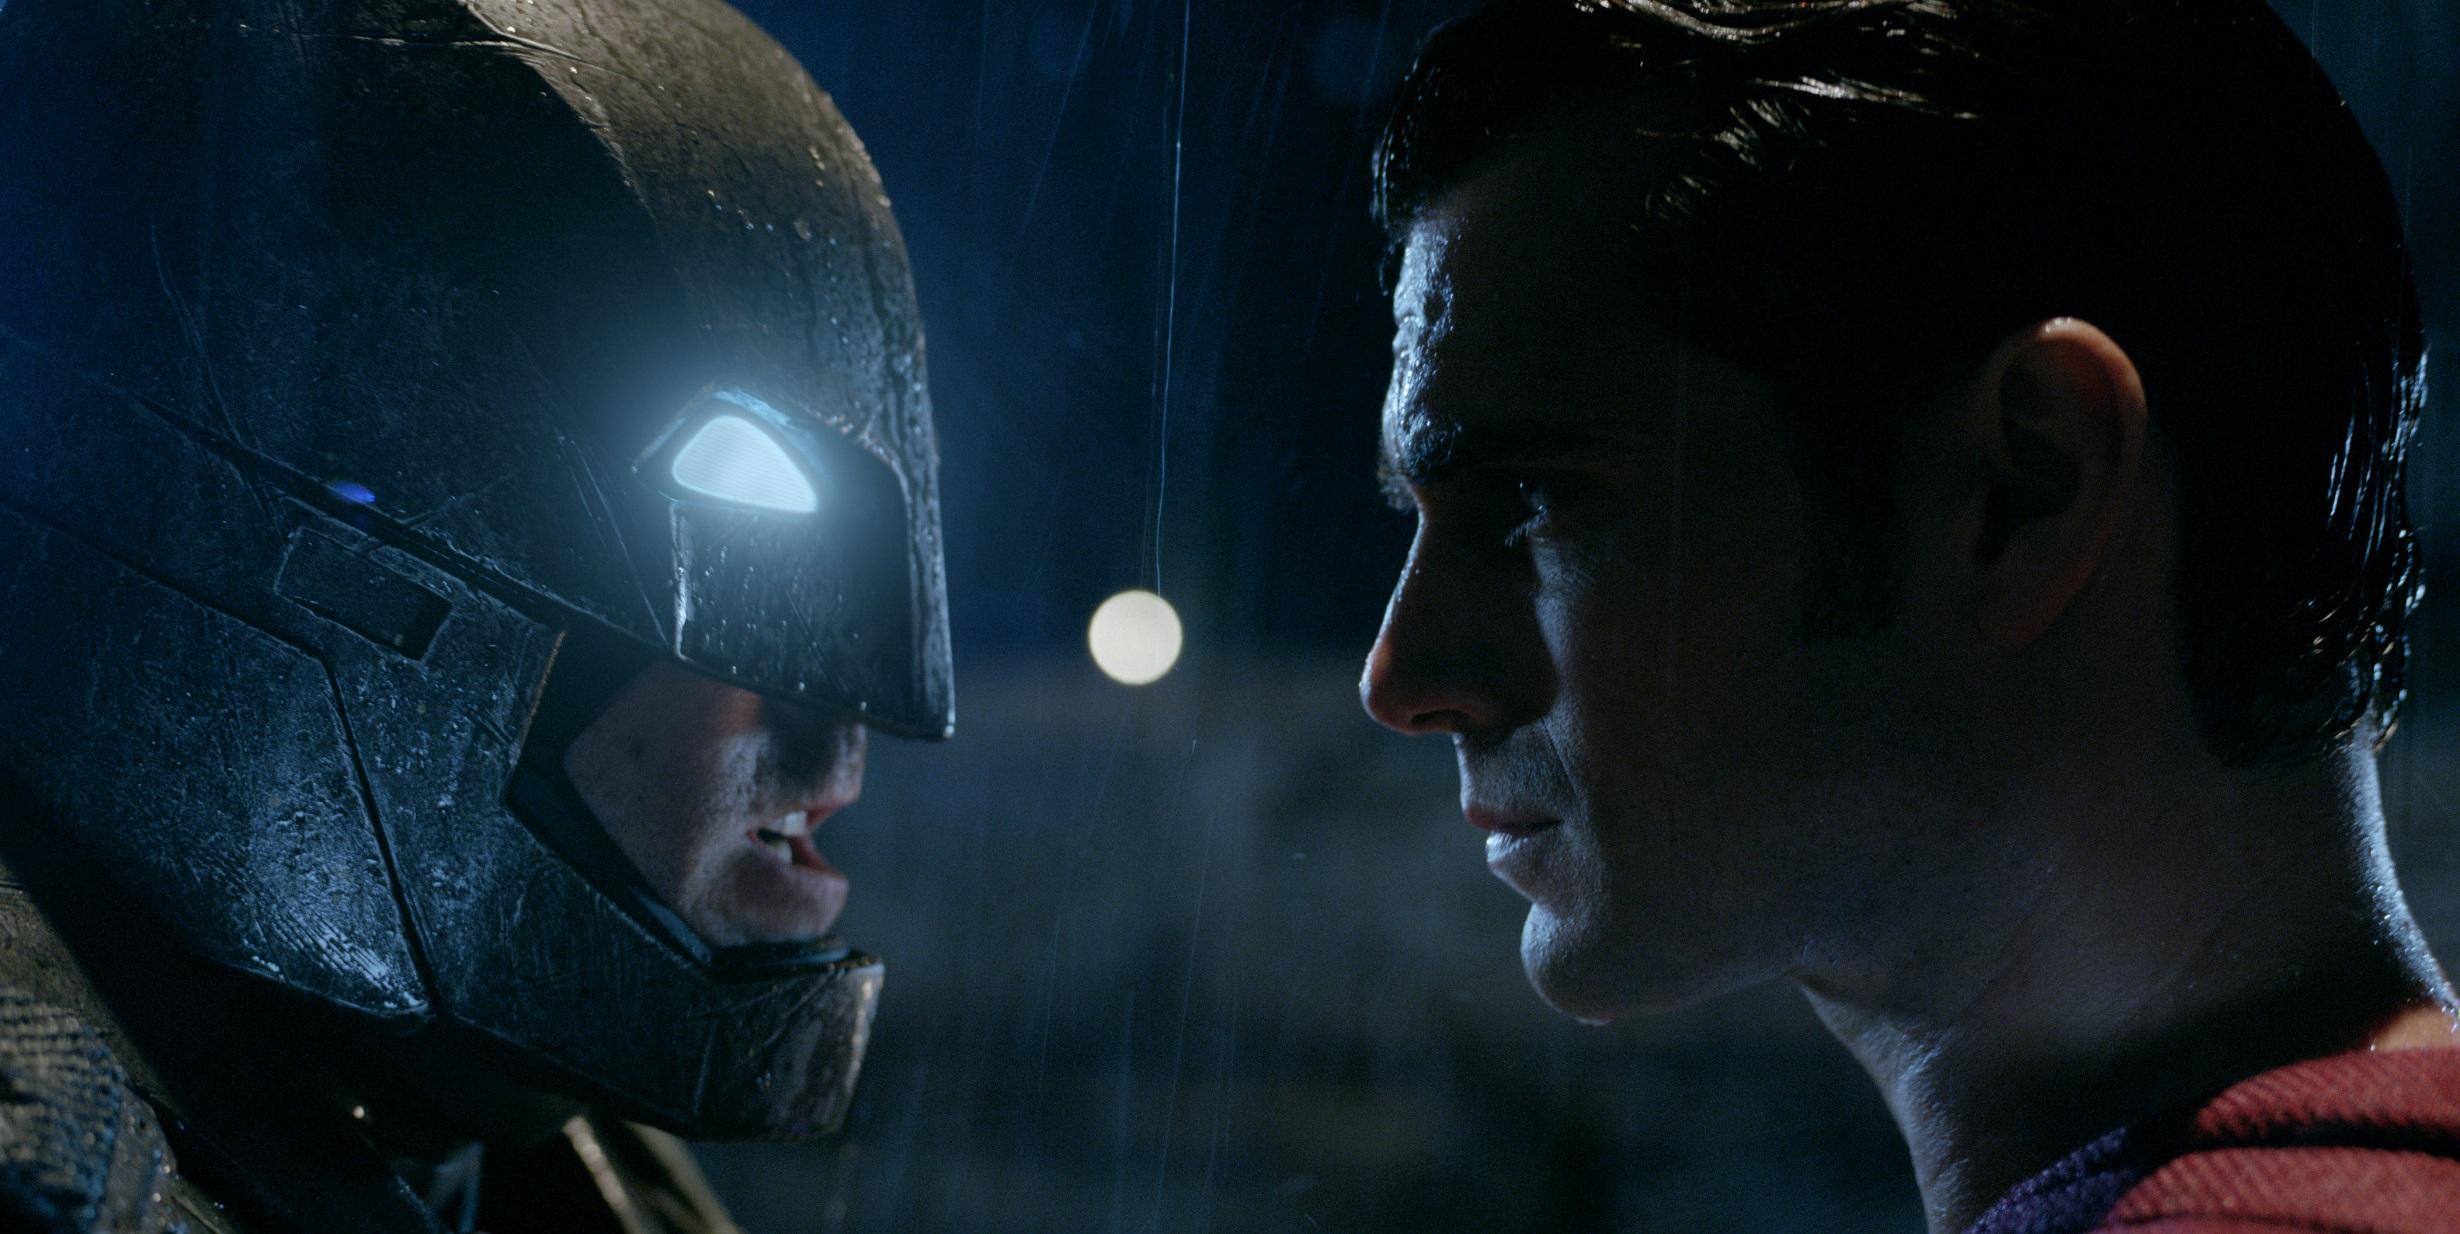 народу бэтмен против супермена картинки бэтмена том, что было